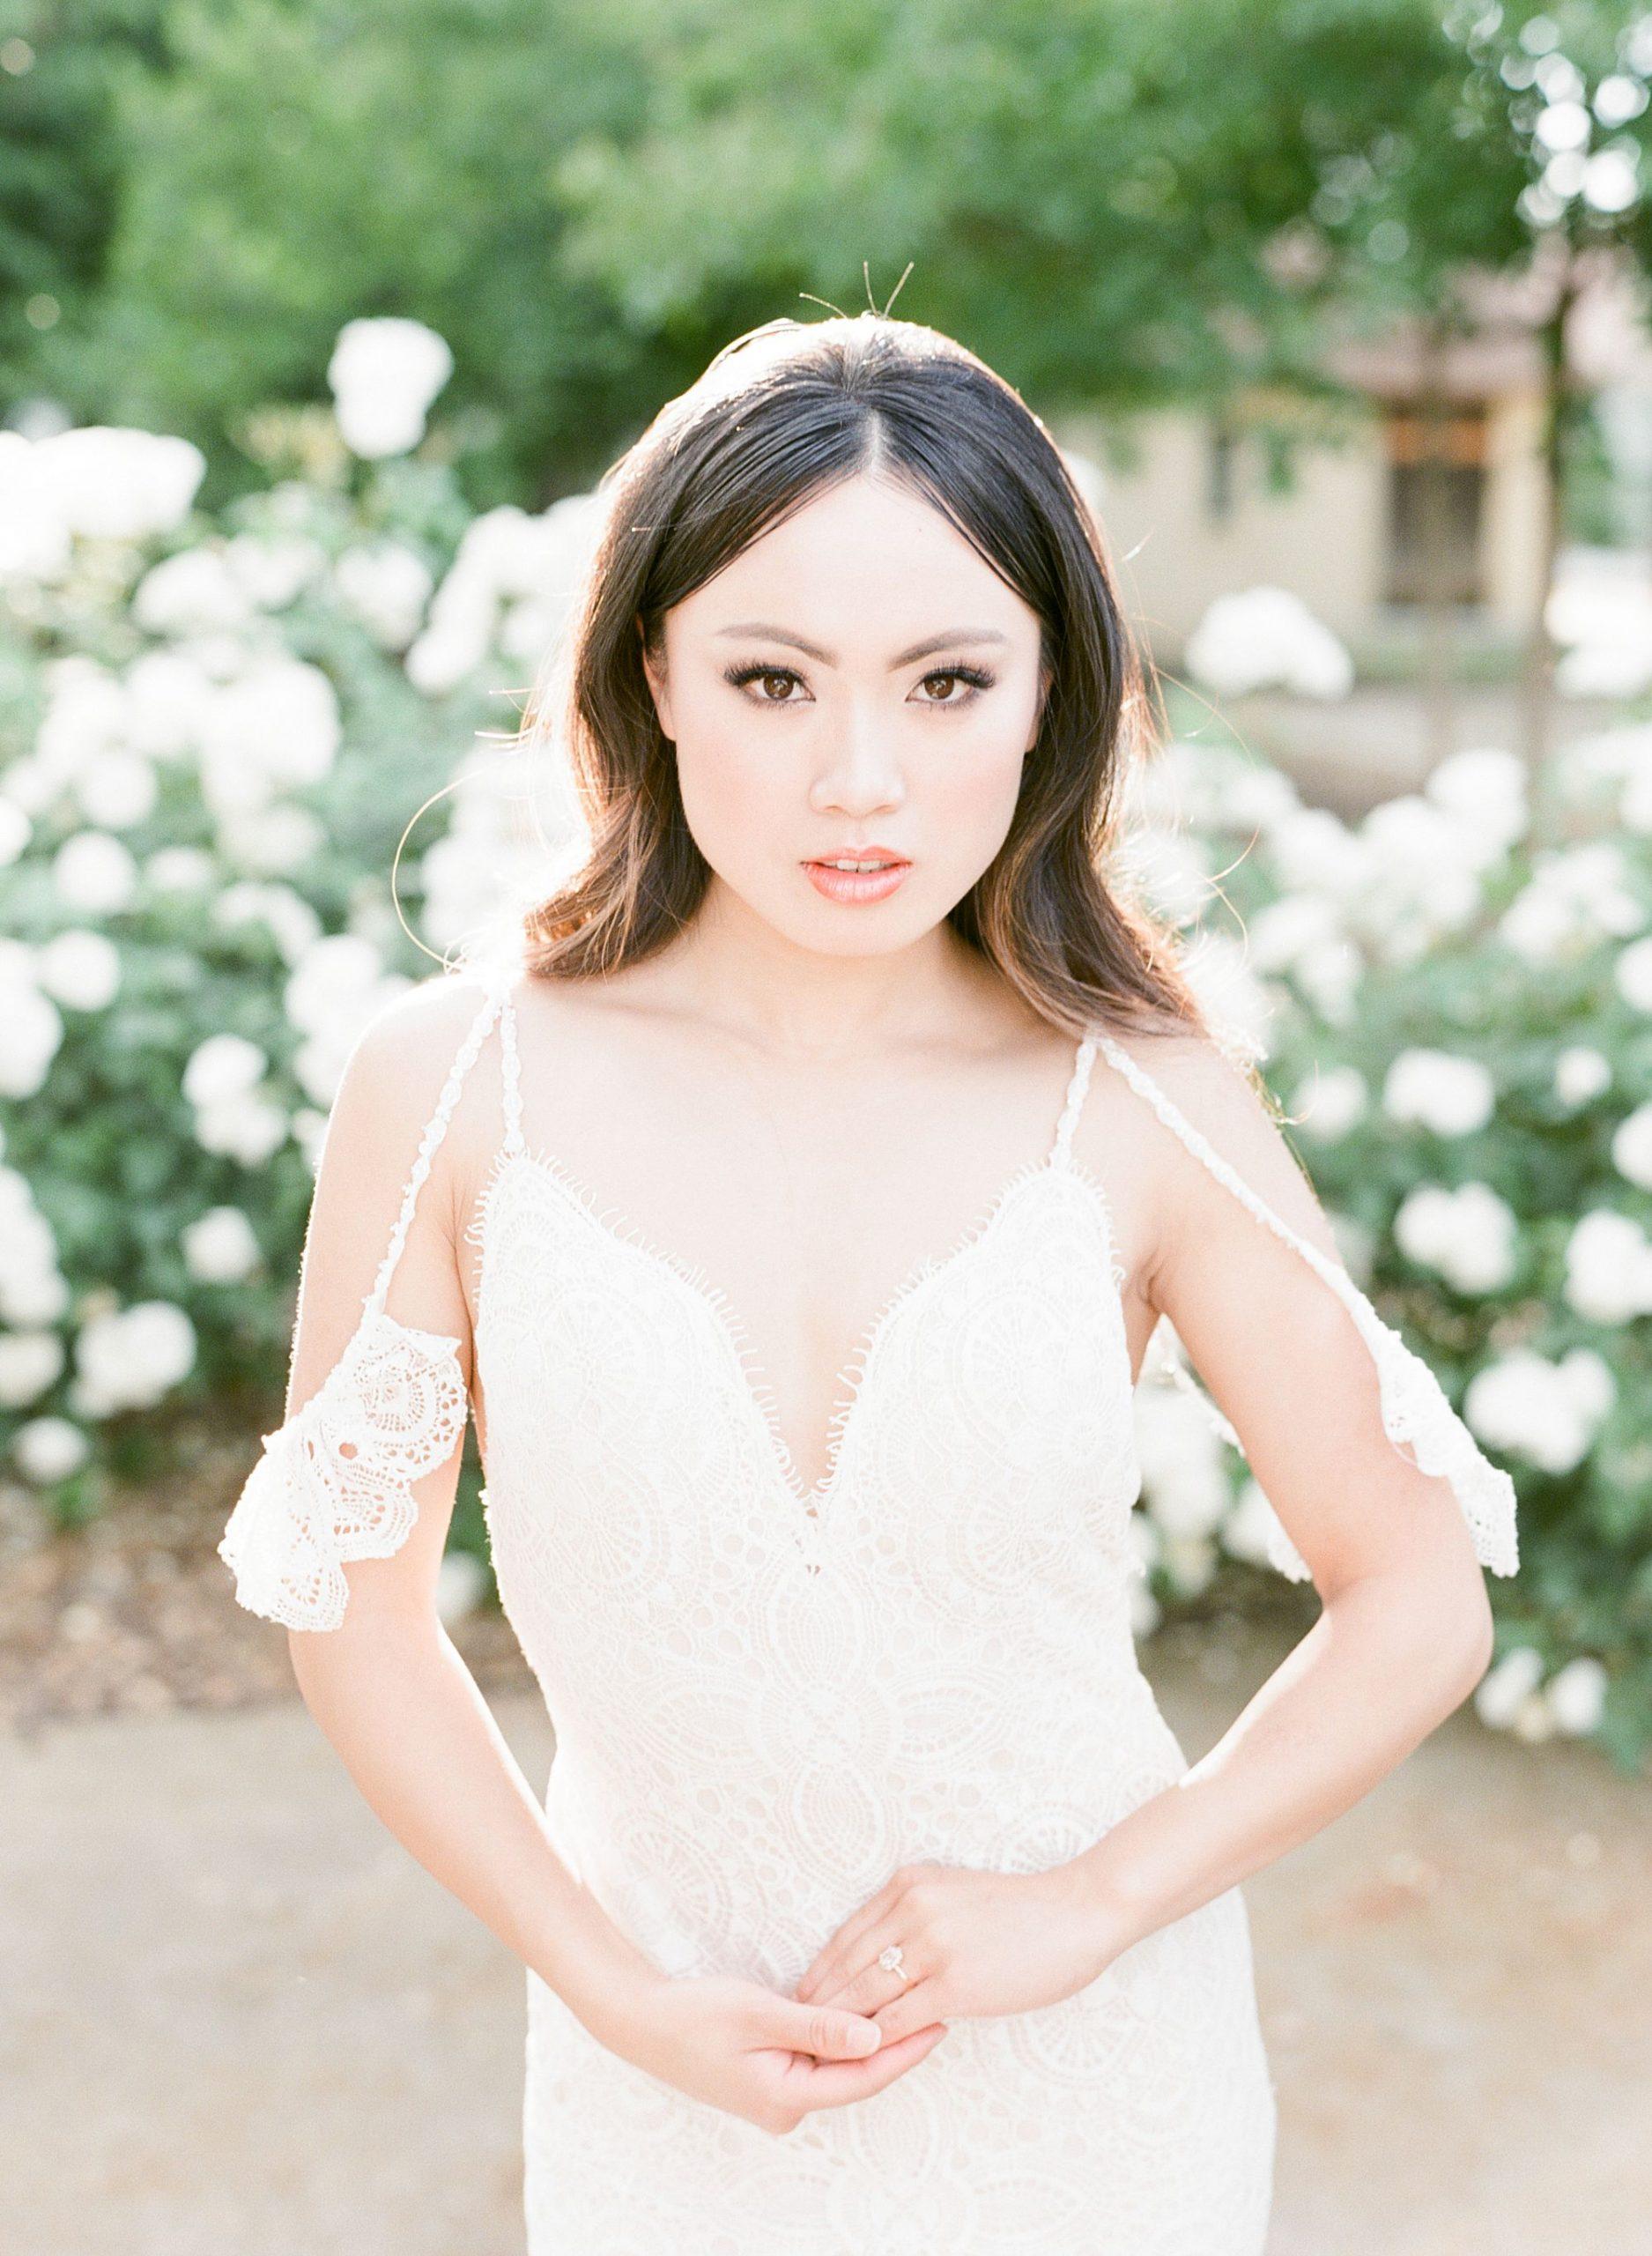 Italian Wedding Inspiration at The Maples Wedding & Event Center - Featured on Wedding Chicks - Ashley Baumgartner - Sacramento Wedding Phtoographer_0022.jpg